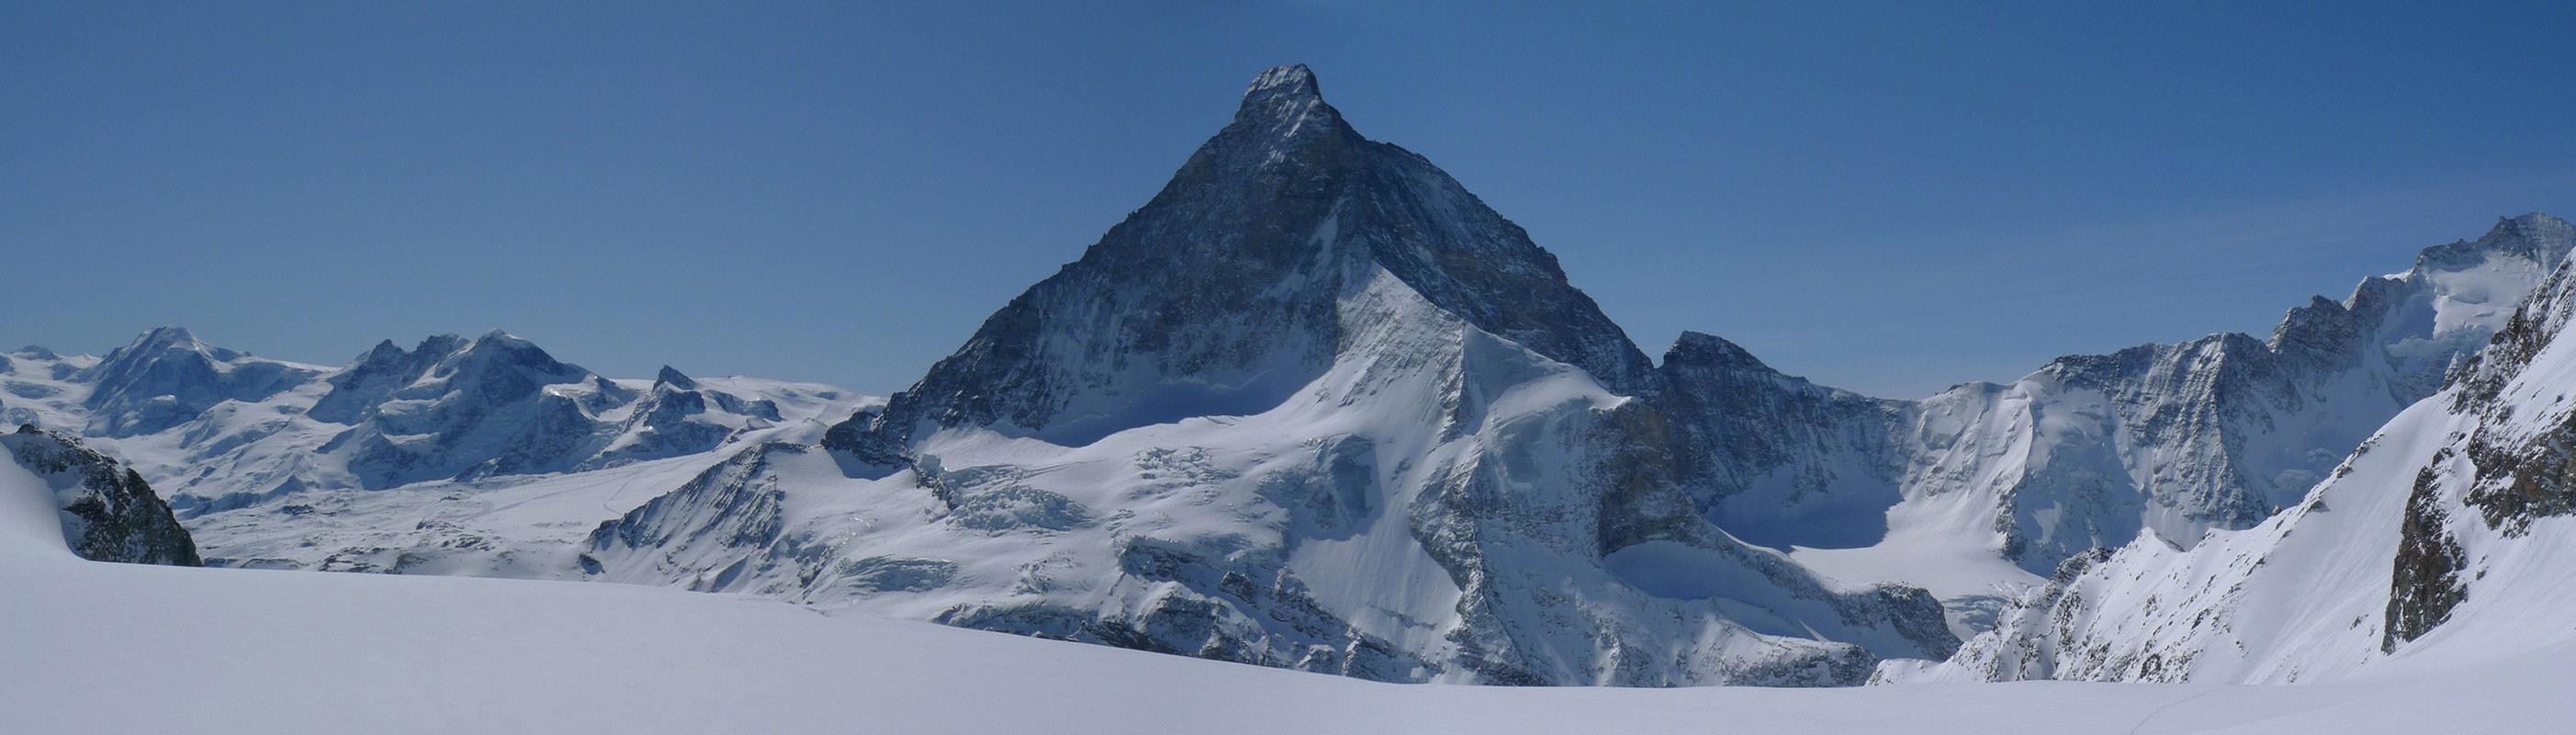 Mont Durand / Arbenhorn Walliser Alpen / Alpes valaisannes Schweiz panorama 37